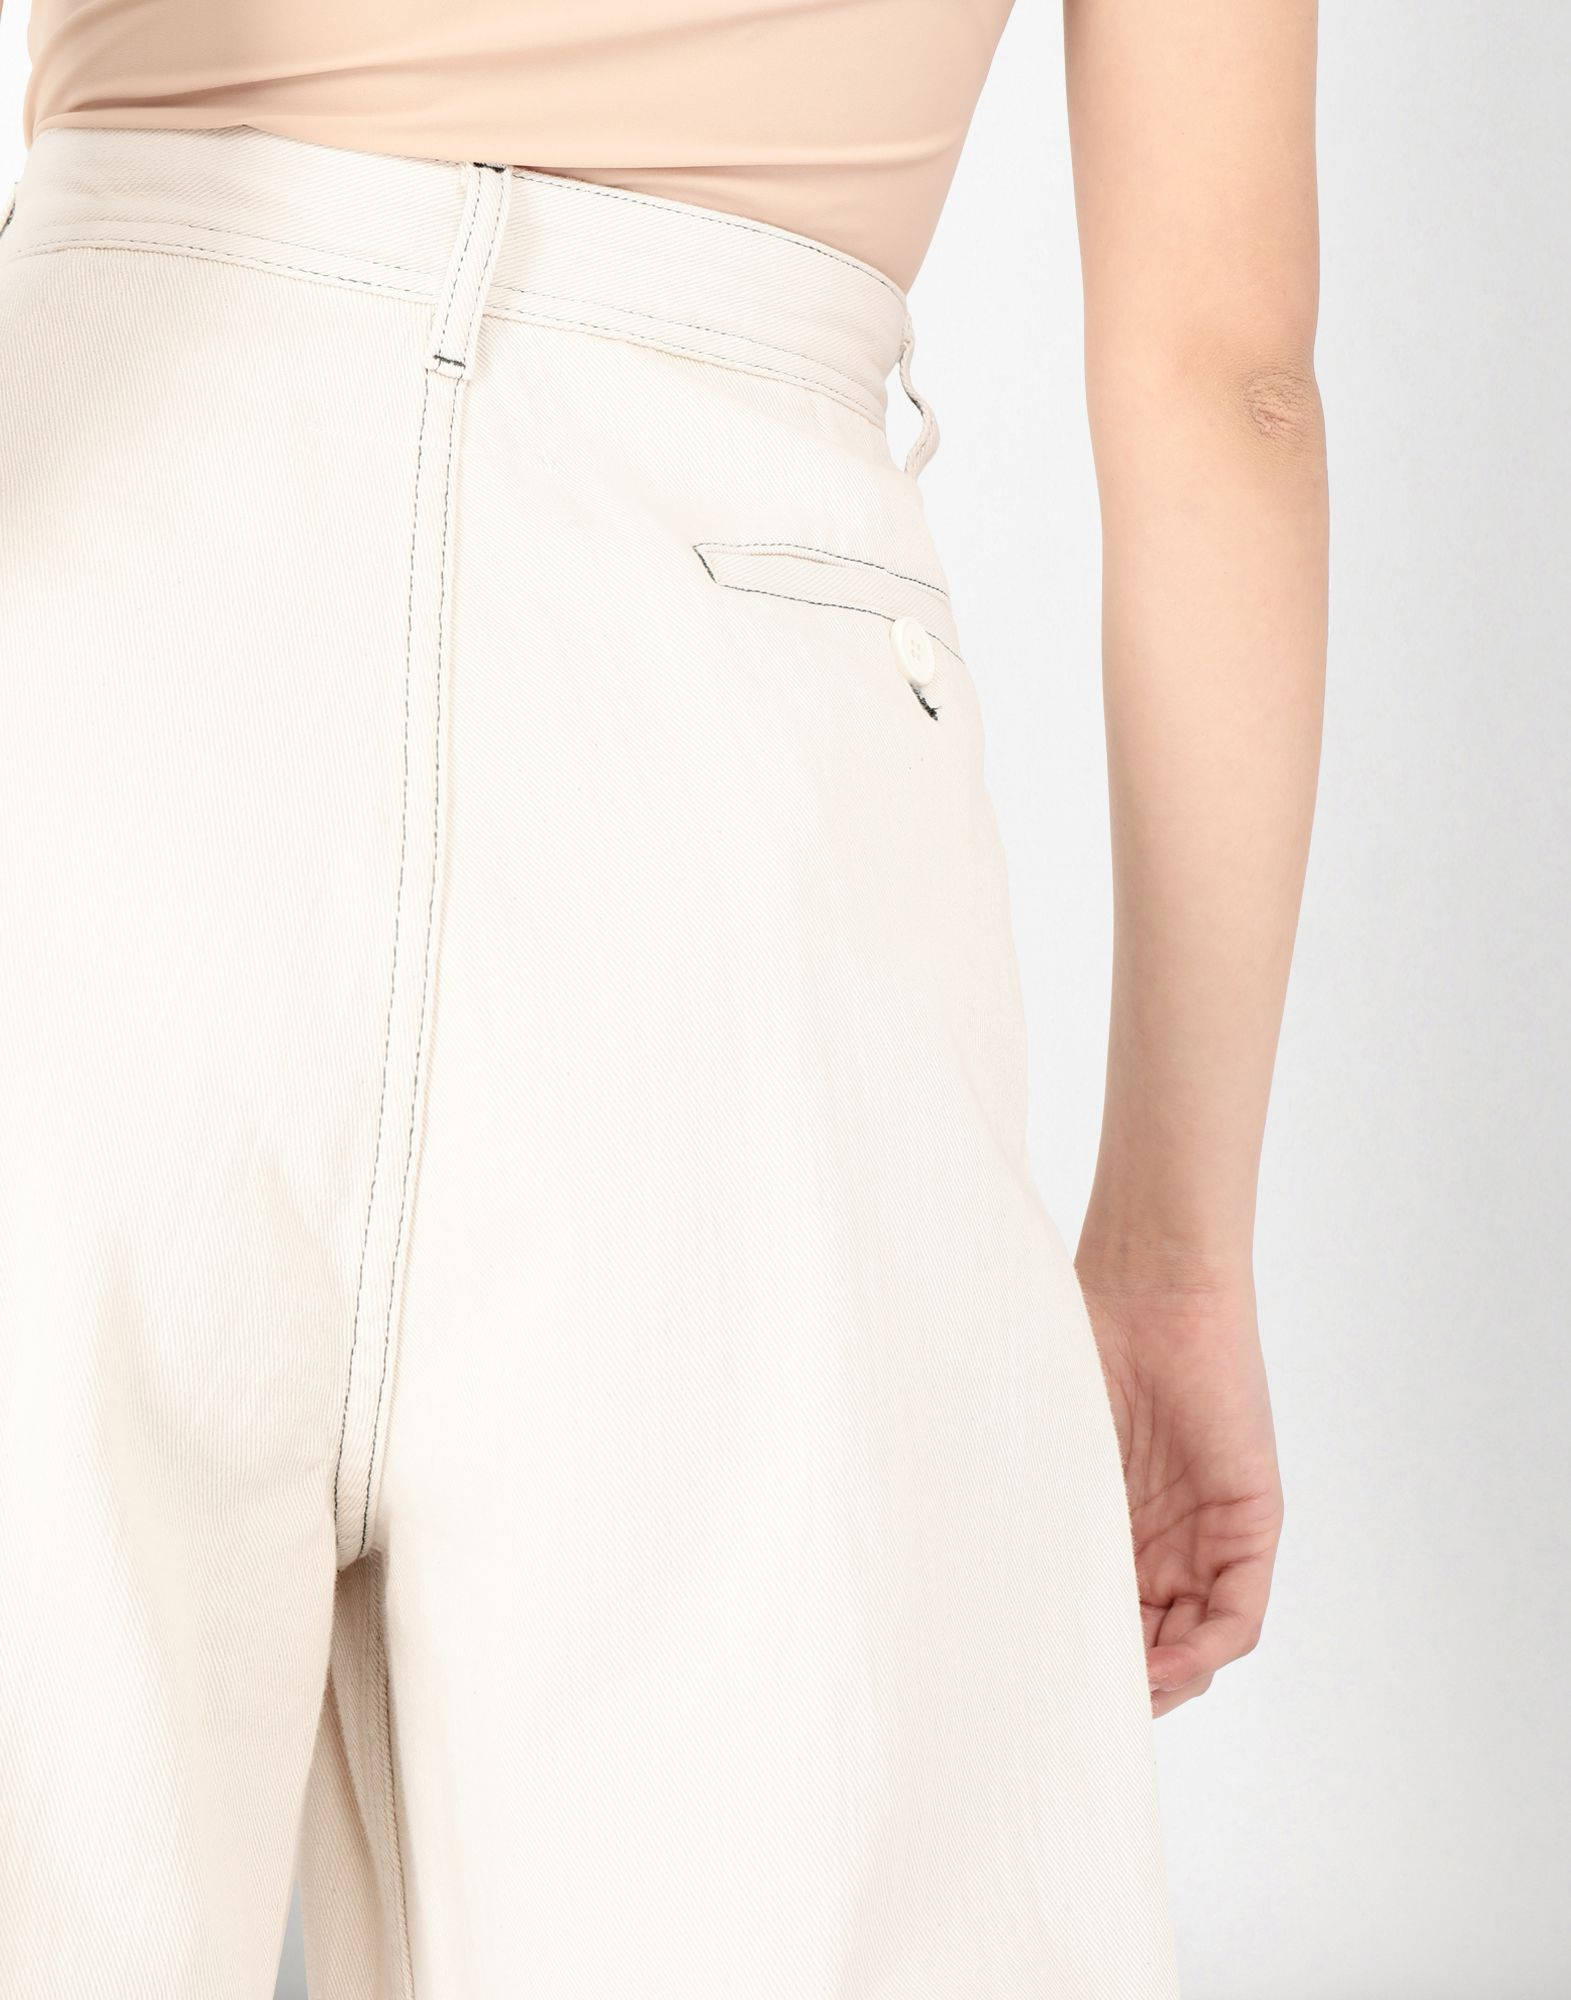 MM6 MAISON MARGIELA Flared cotton trousers Casual pants Woman a